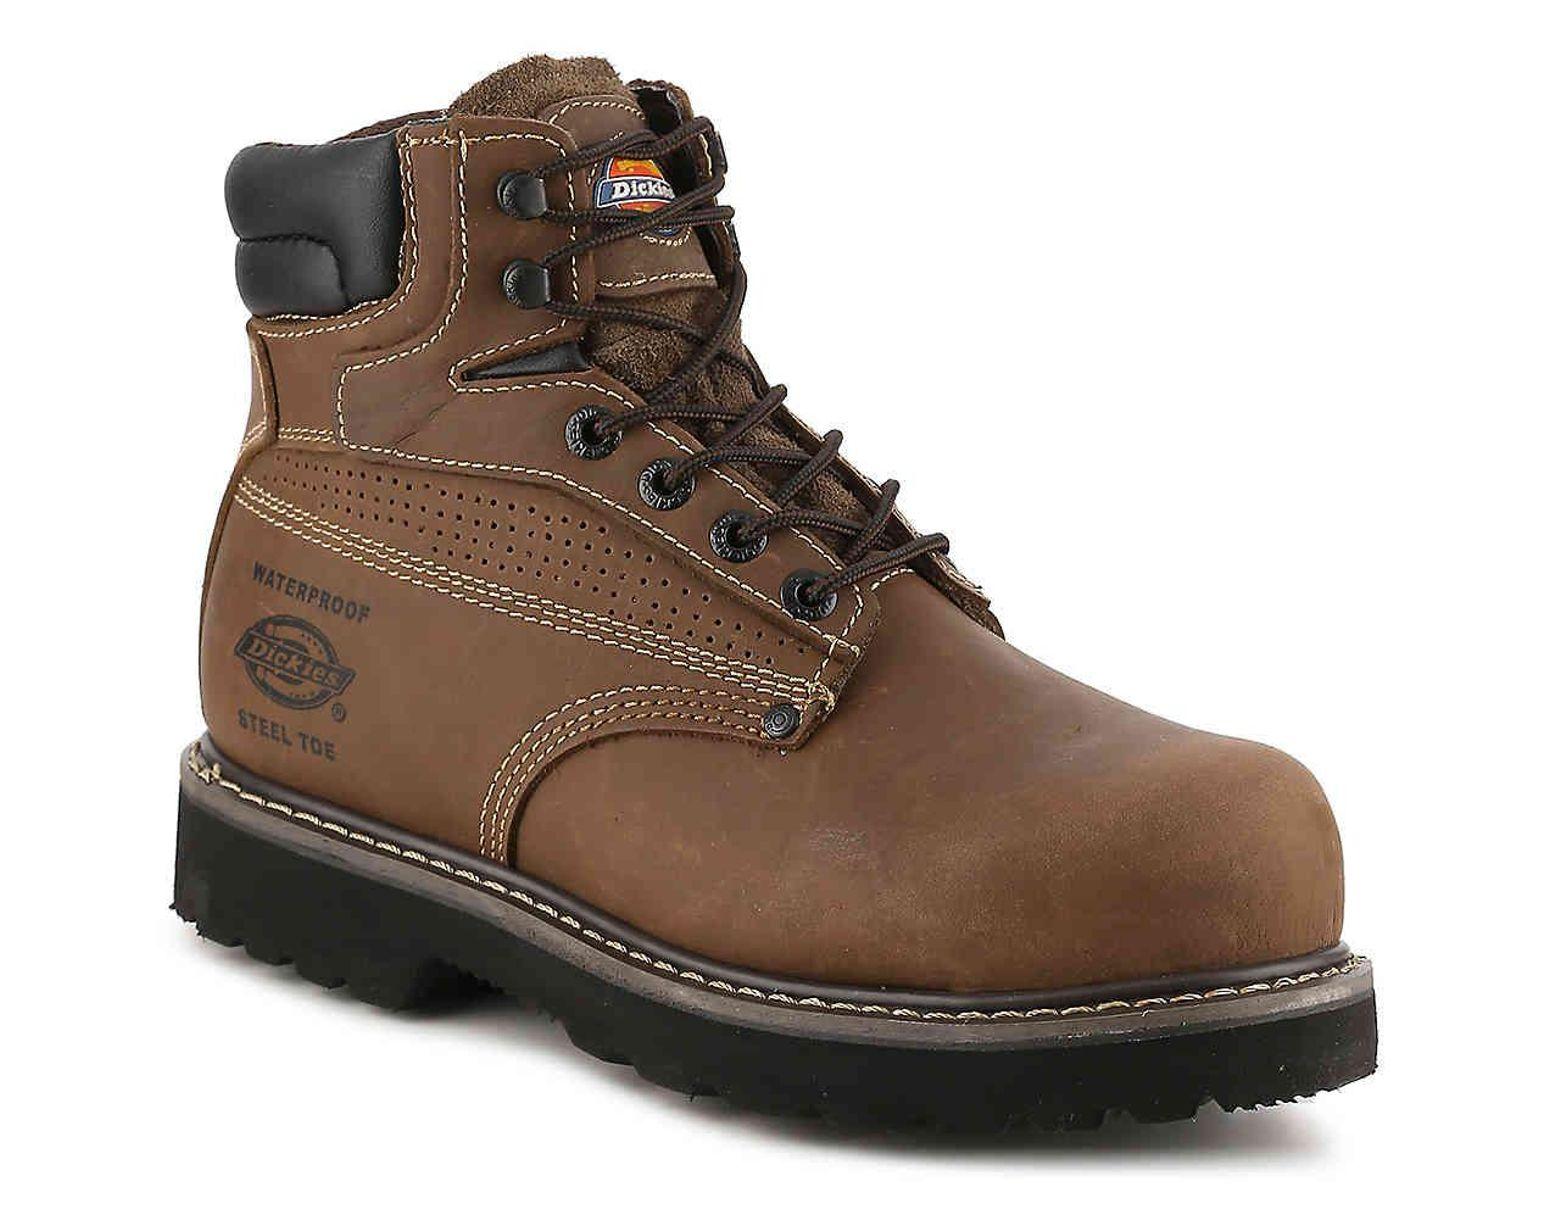 0feda627deb Men's Brown Breaker Steel Toe Work Boot